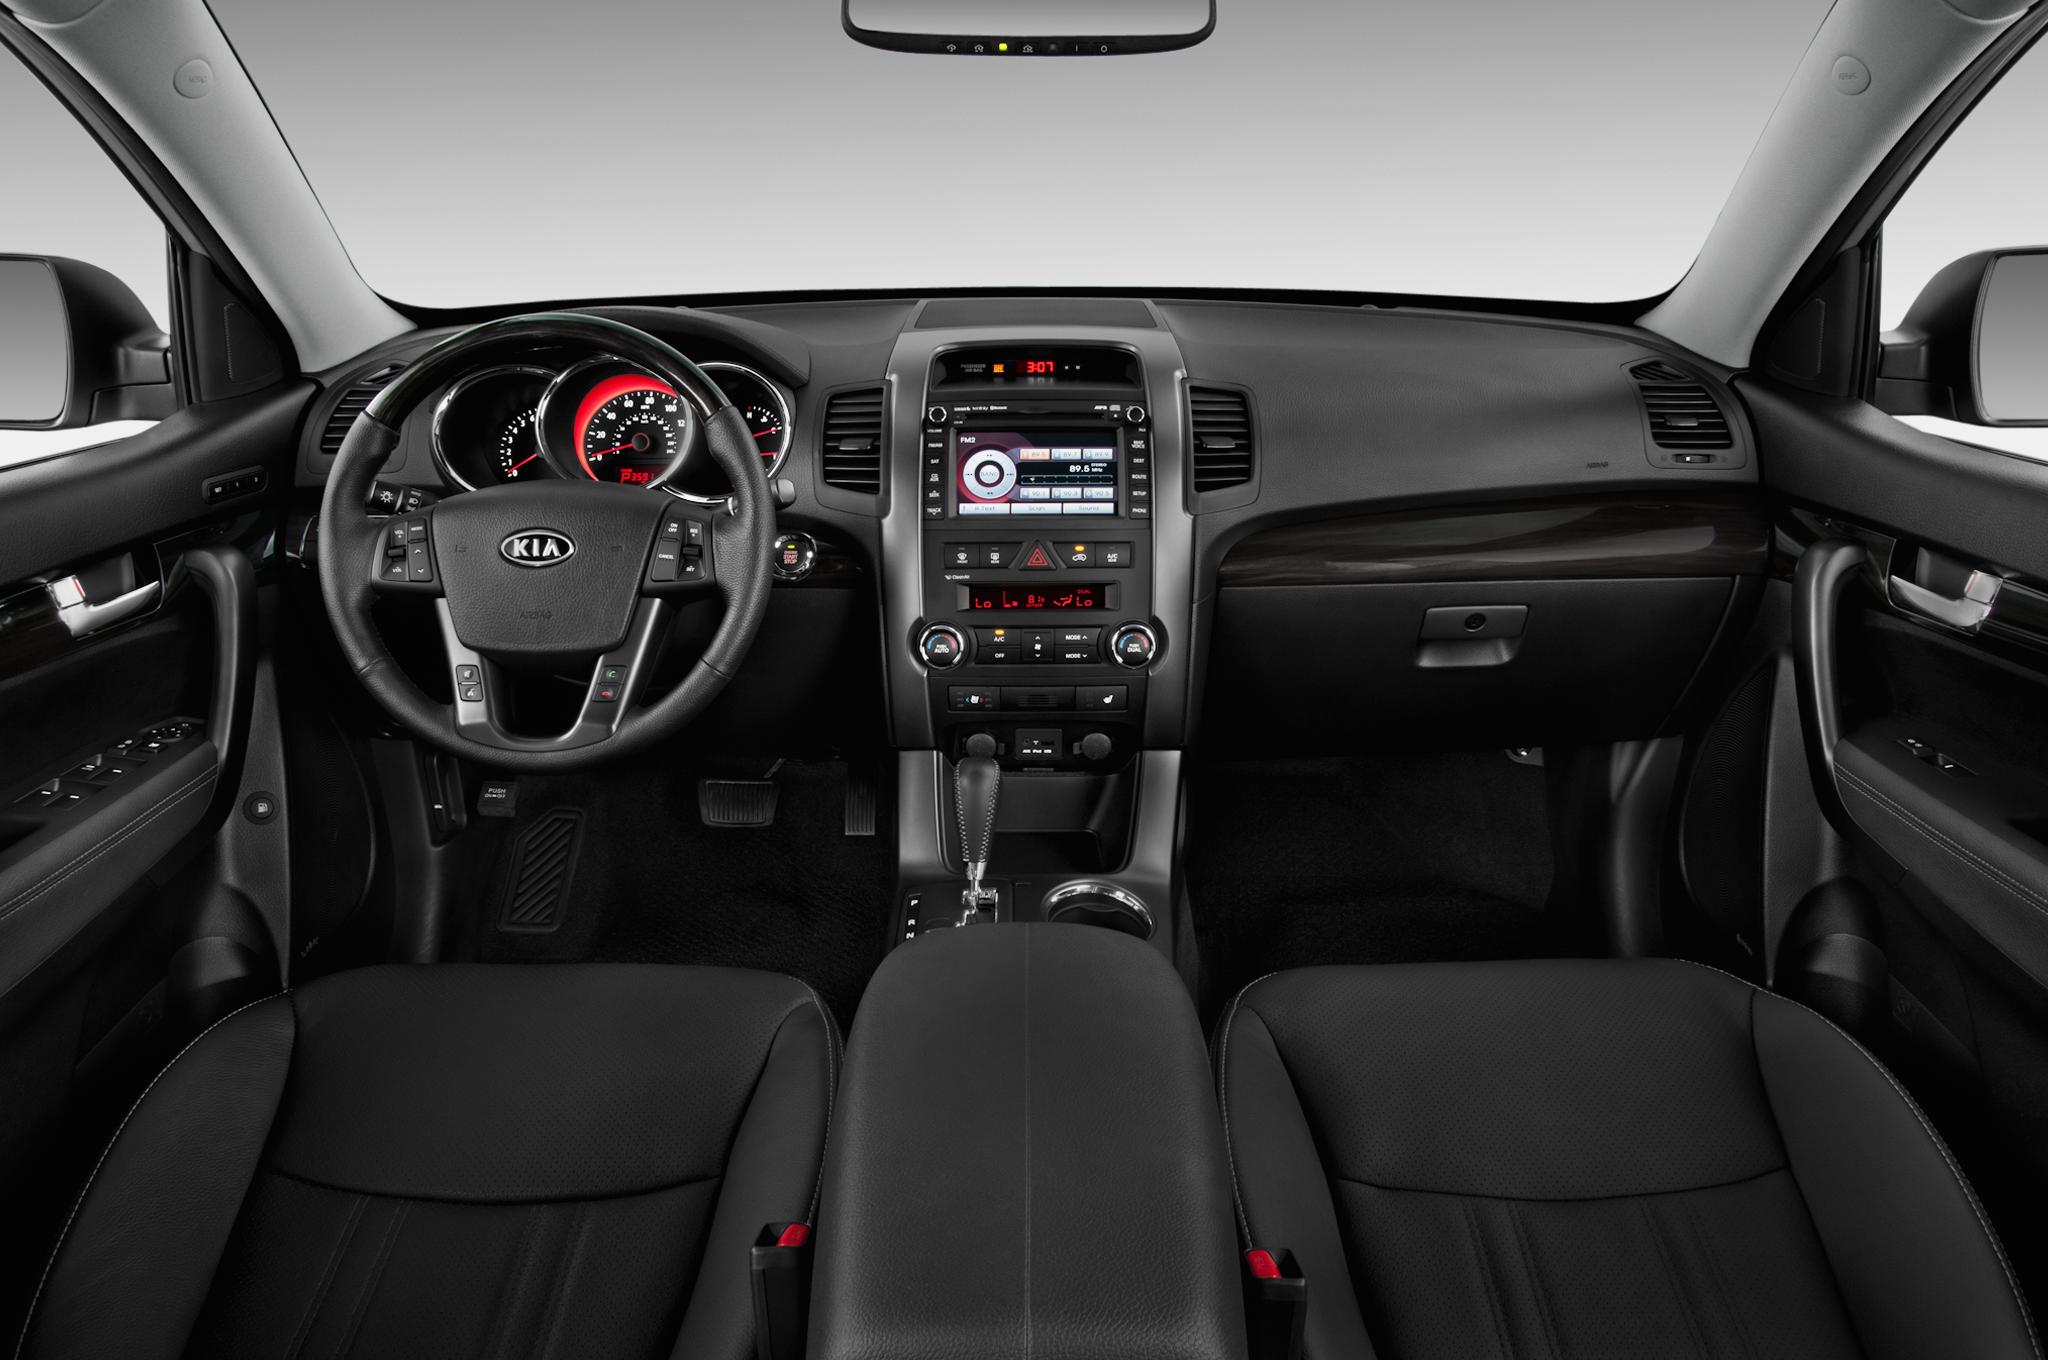 Kia Sorento 2013 (Обзор) Технические характеристики